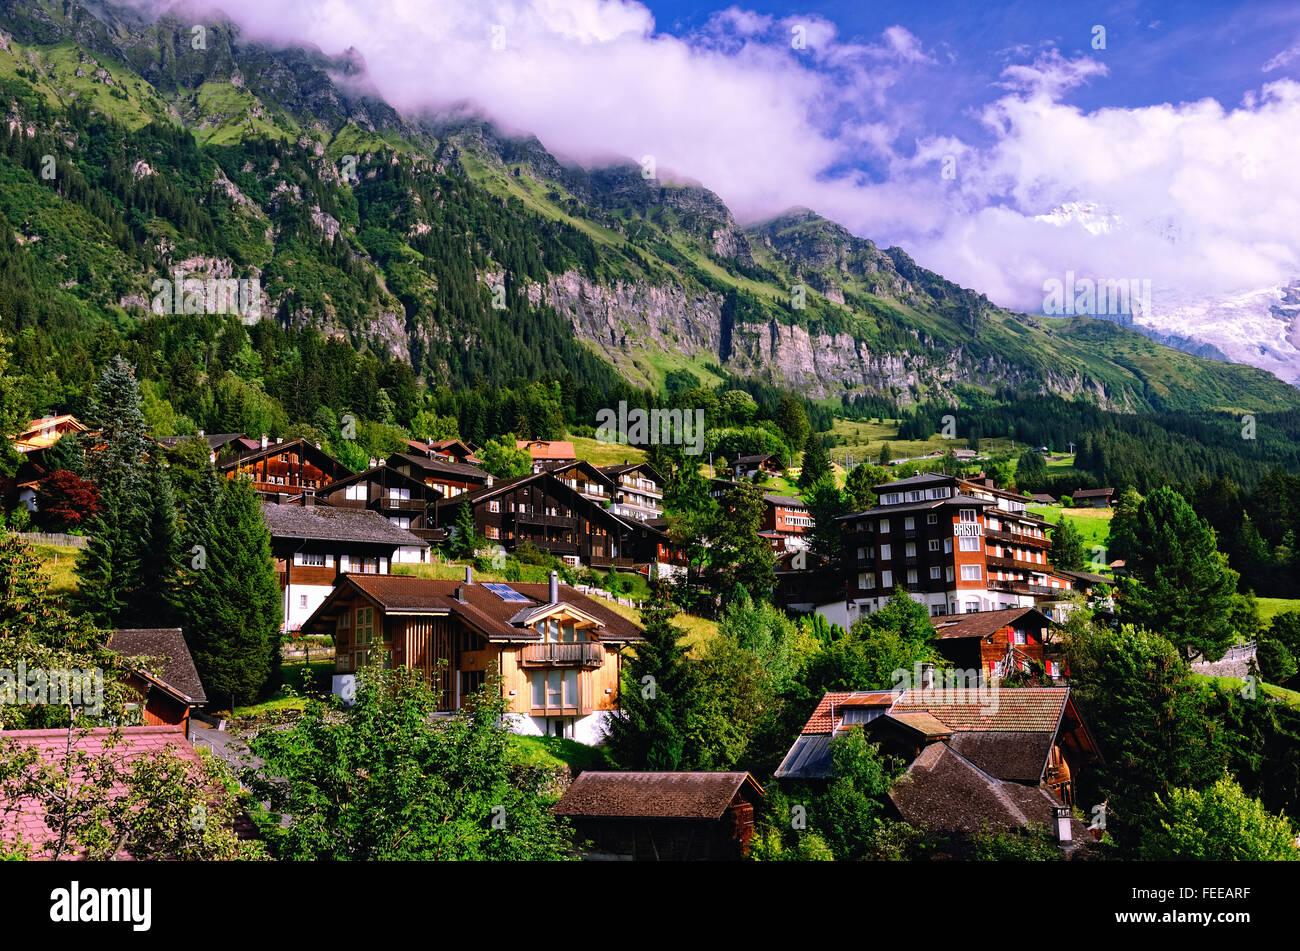 Resort Village of Wengen on the Slopes of Lauterbrunnen Valley in Bernese Oberland (Swiss Alps, Jungfrau Region, - Stock Image